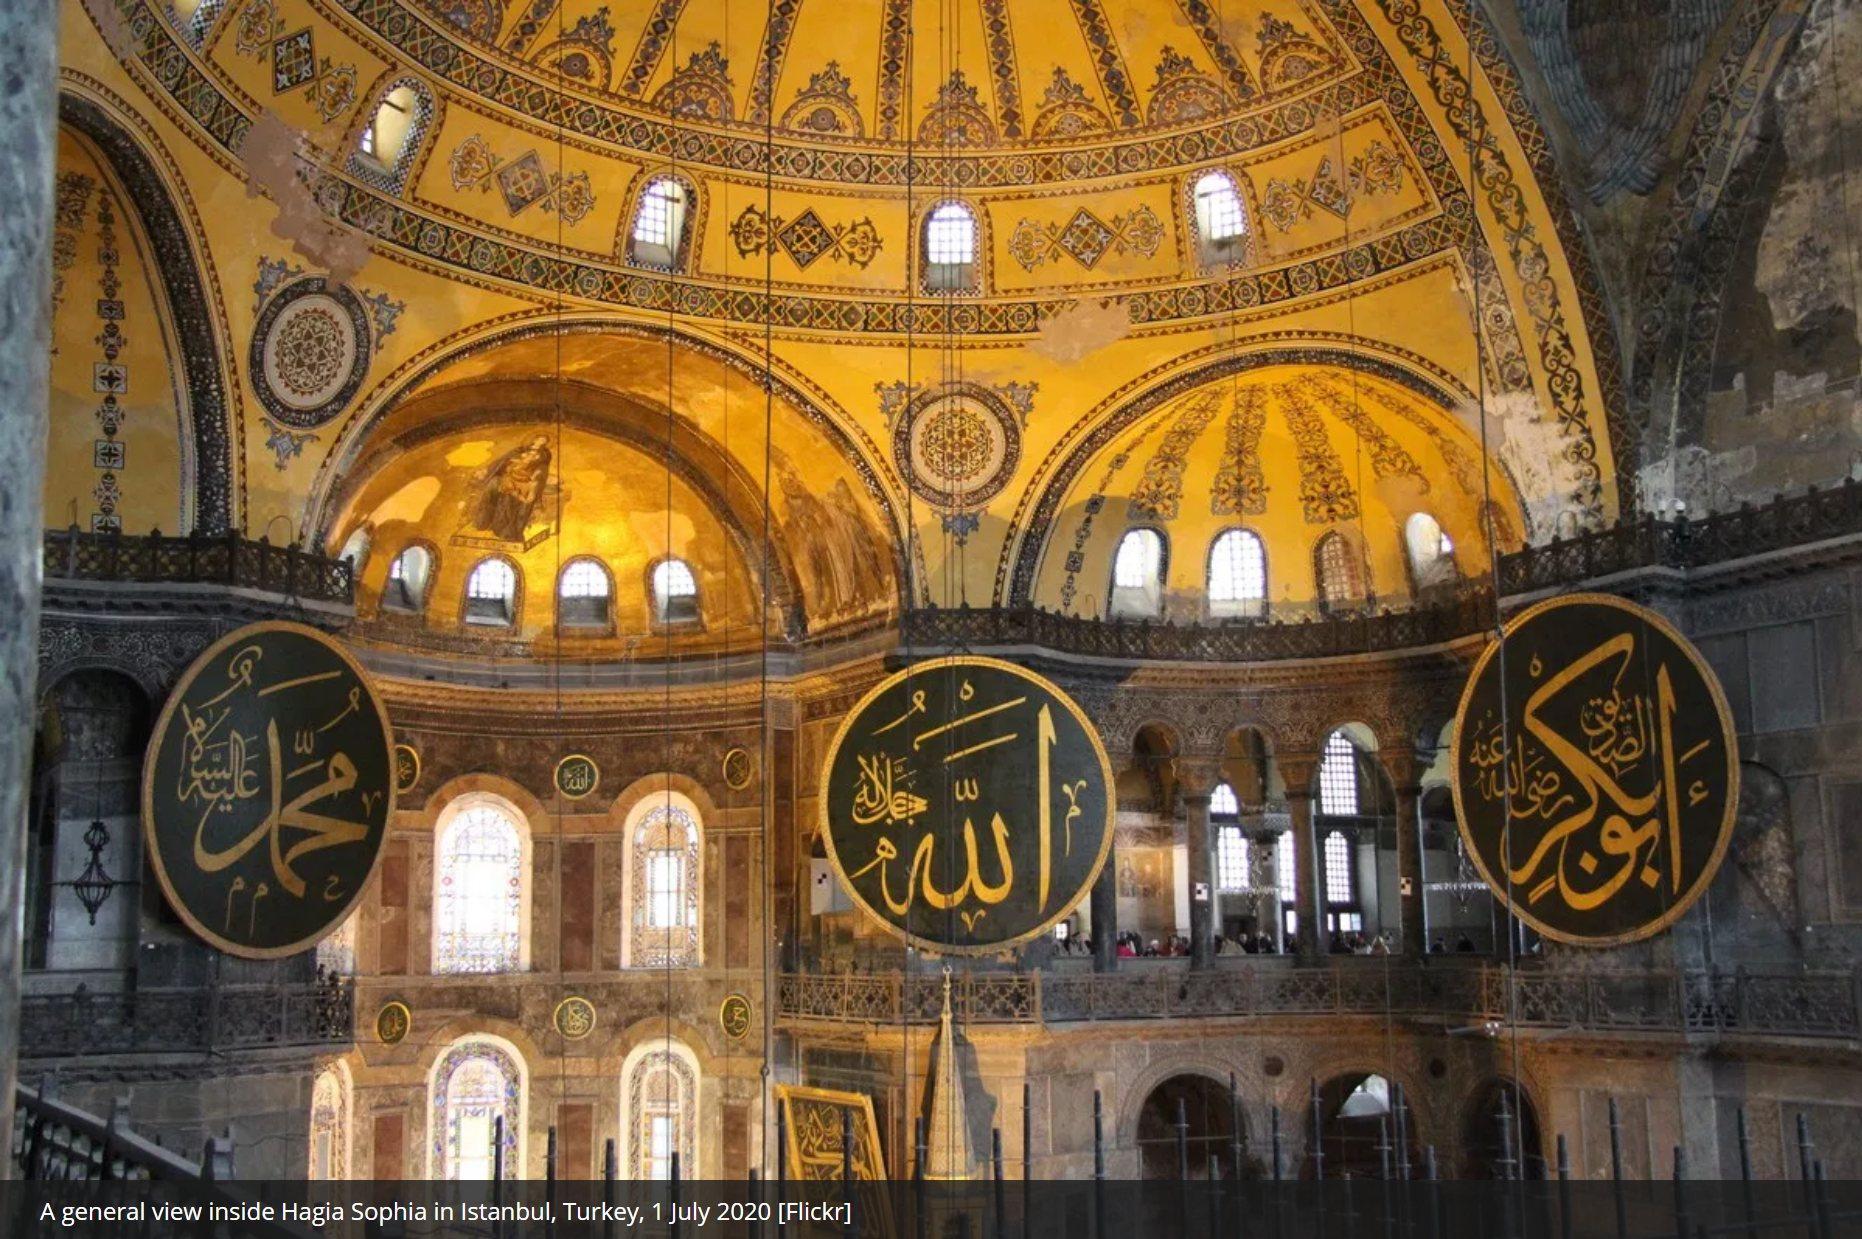 Turkey overruled 'radical decision' that made Hagia Sophia a museum